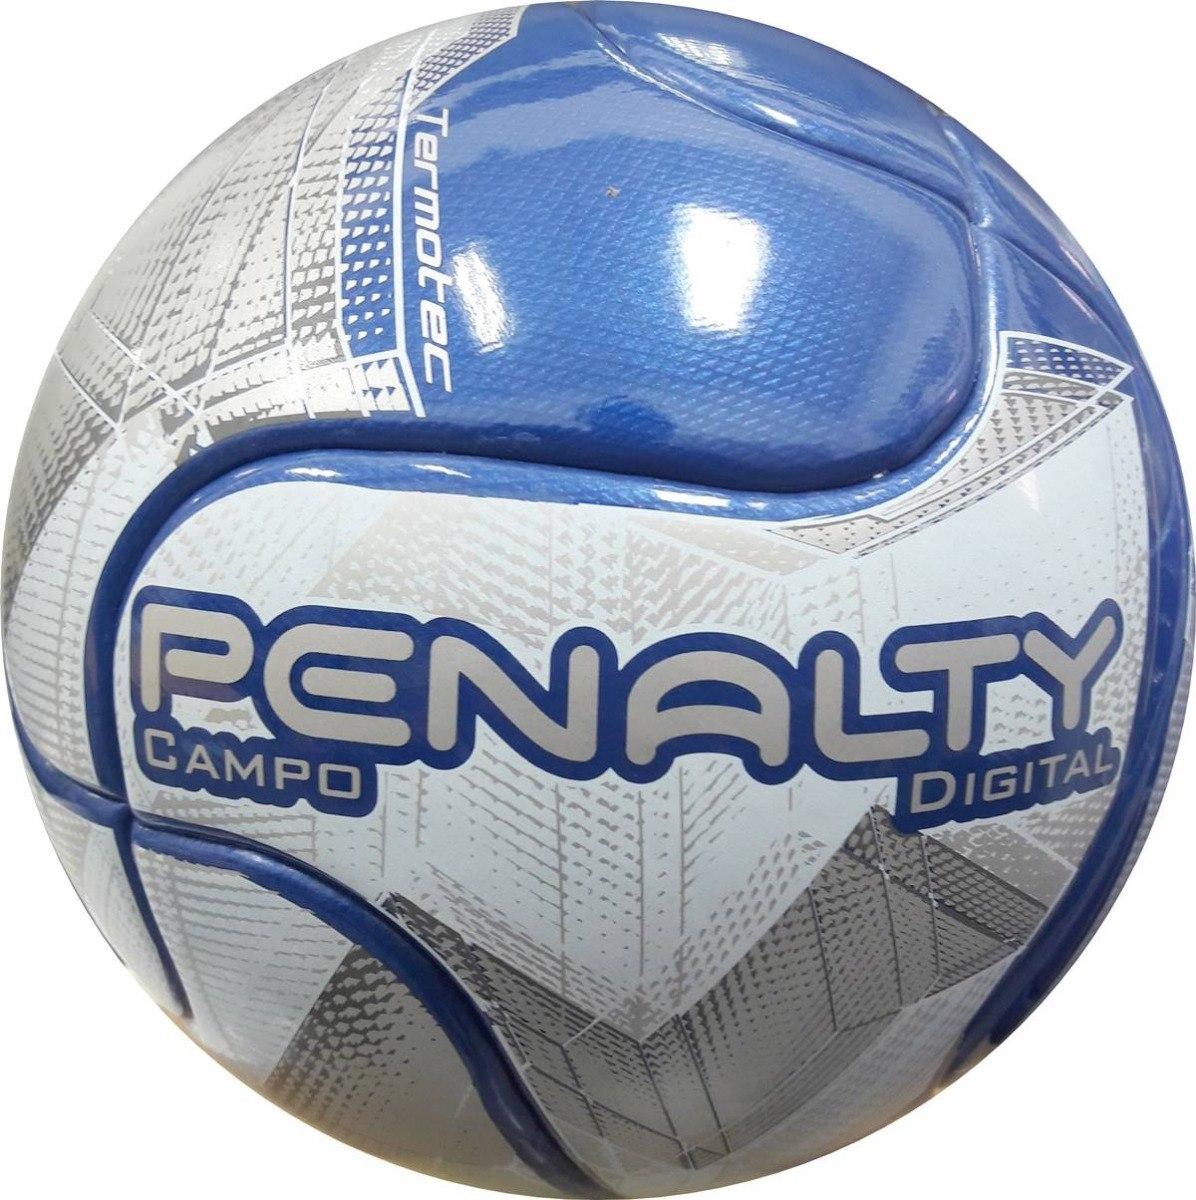 bola penalty digital termotec vii campo. Carregando zoom. a75adfb9873a1